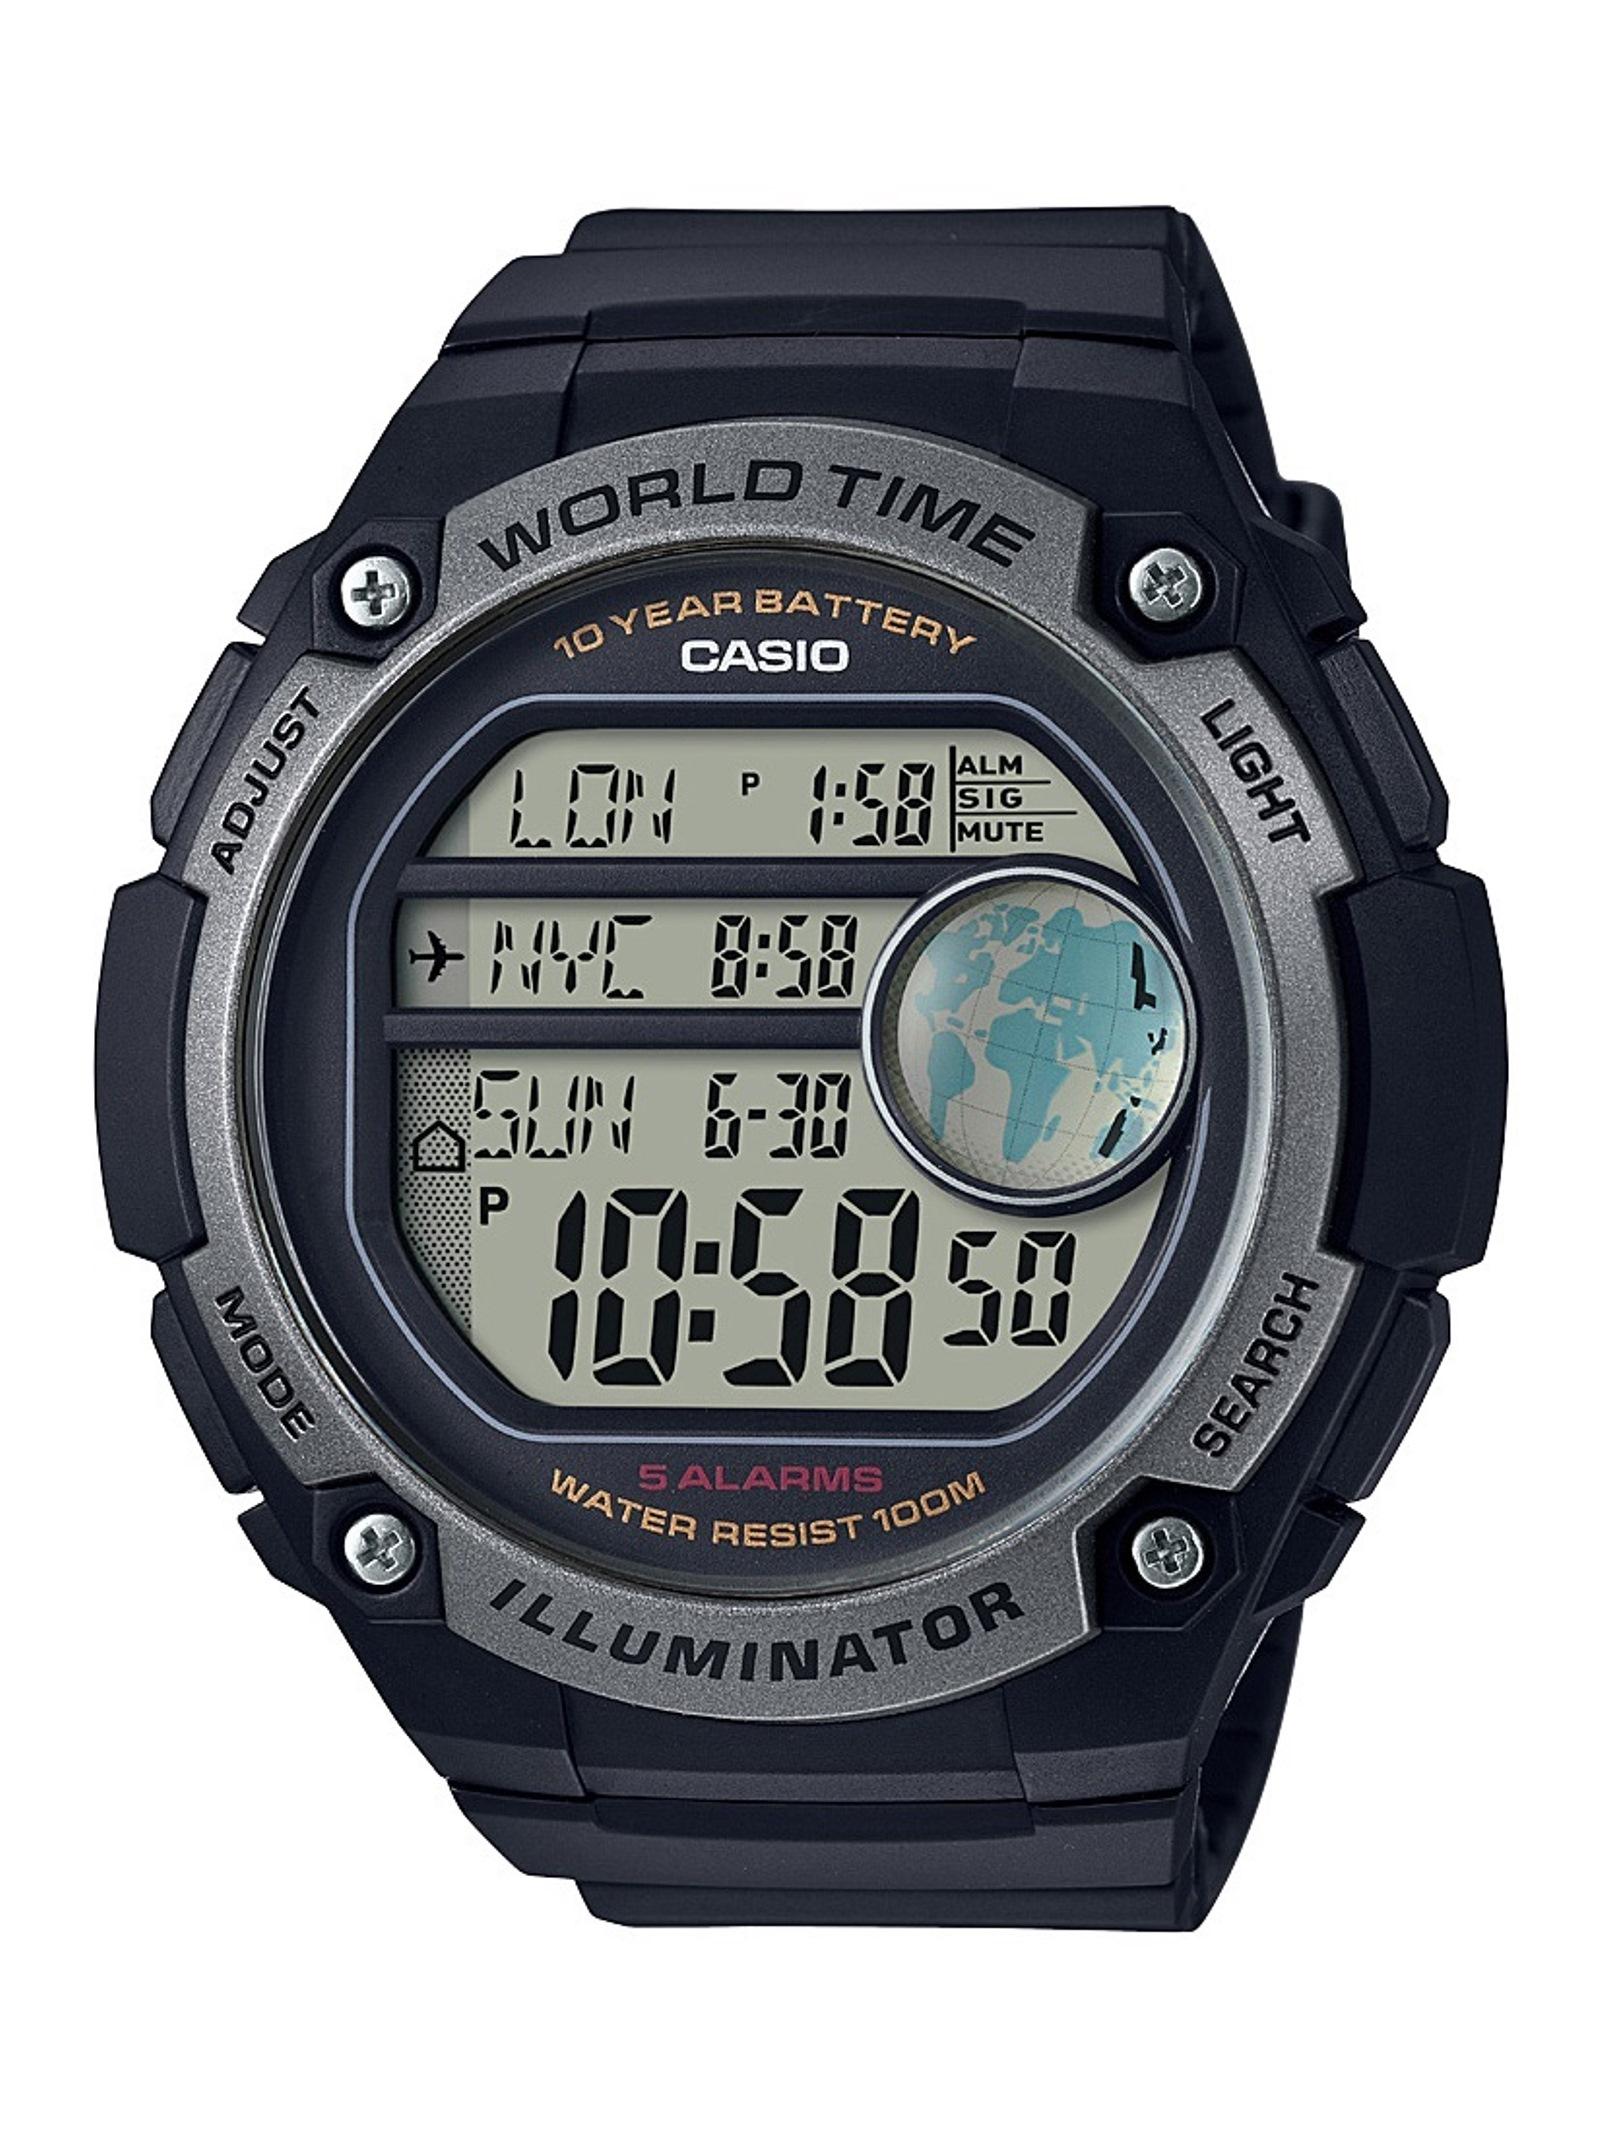 Casio Men' Large Case 10 Year Battery Watch